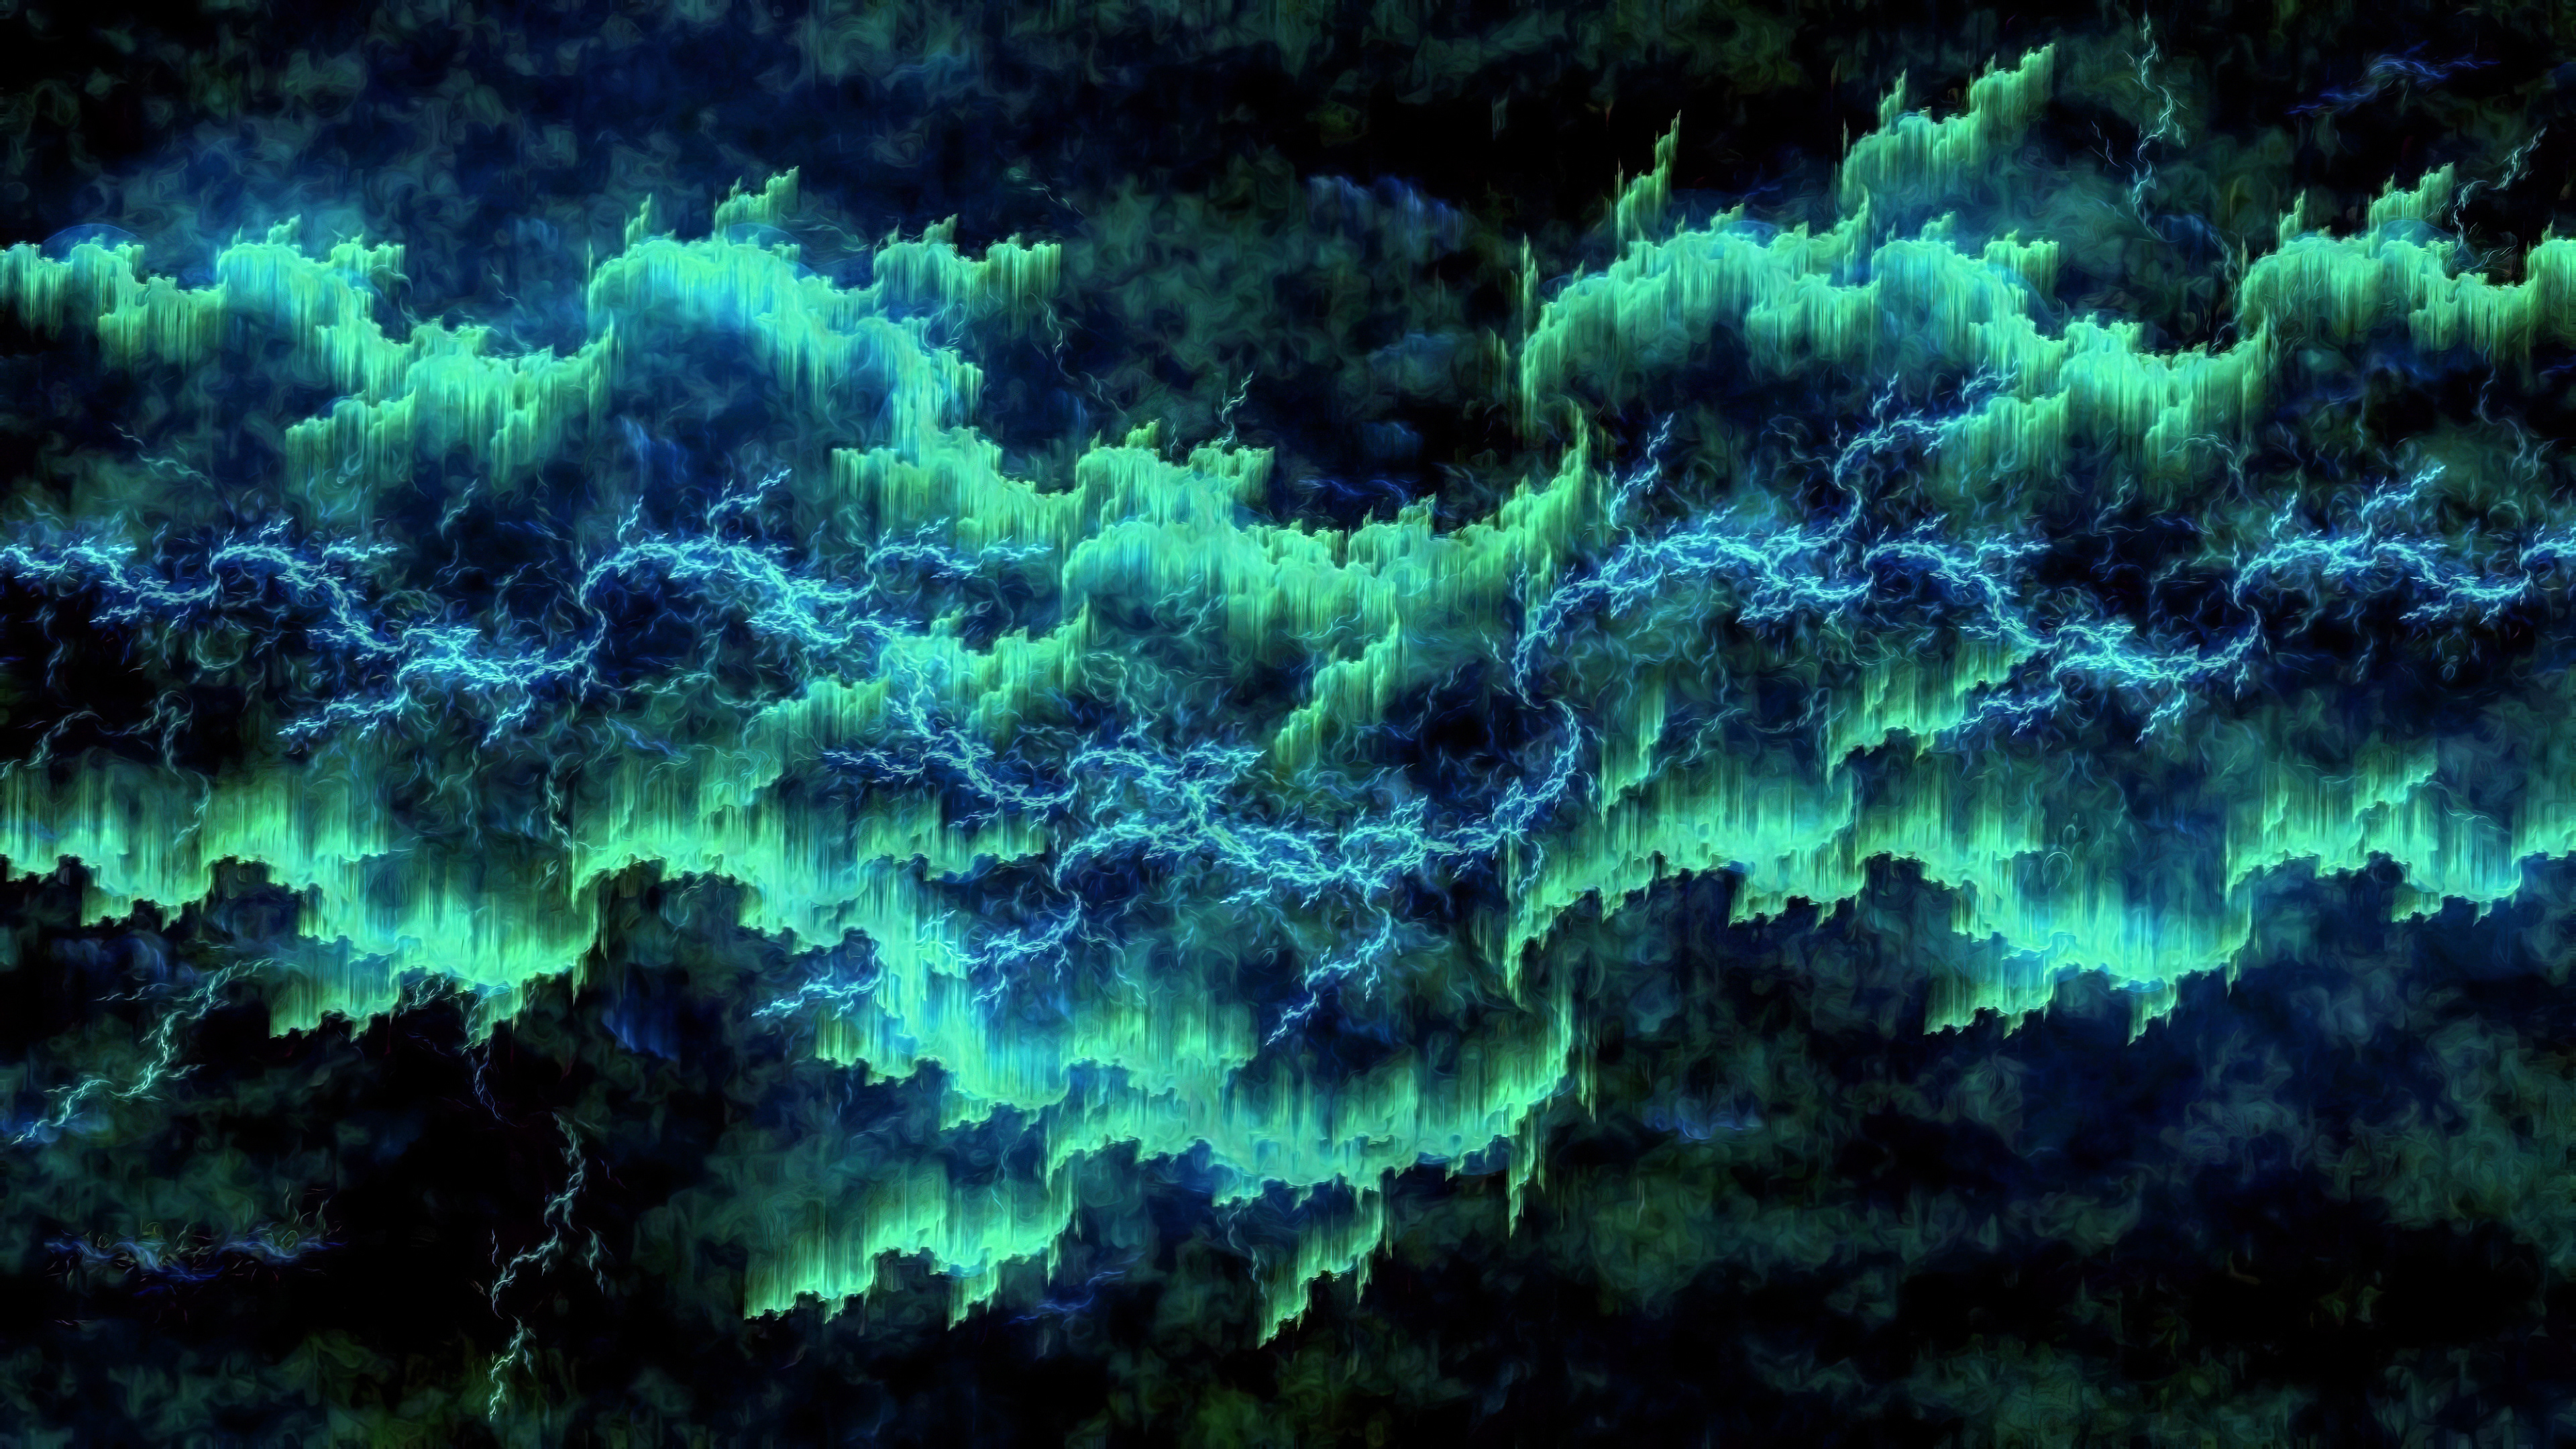 auroa borealis lightning 1578254975 - Auroa Borealis Lightning -